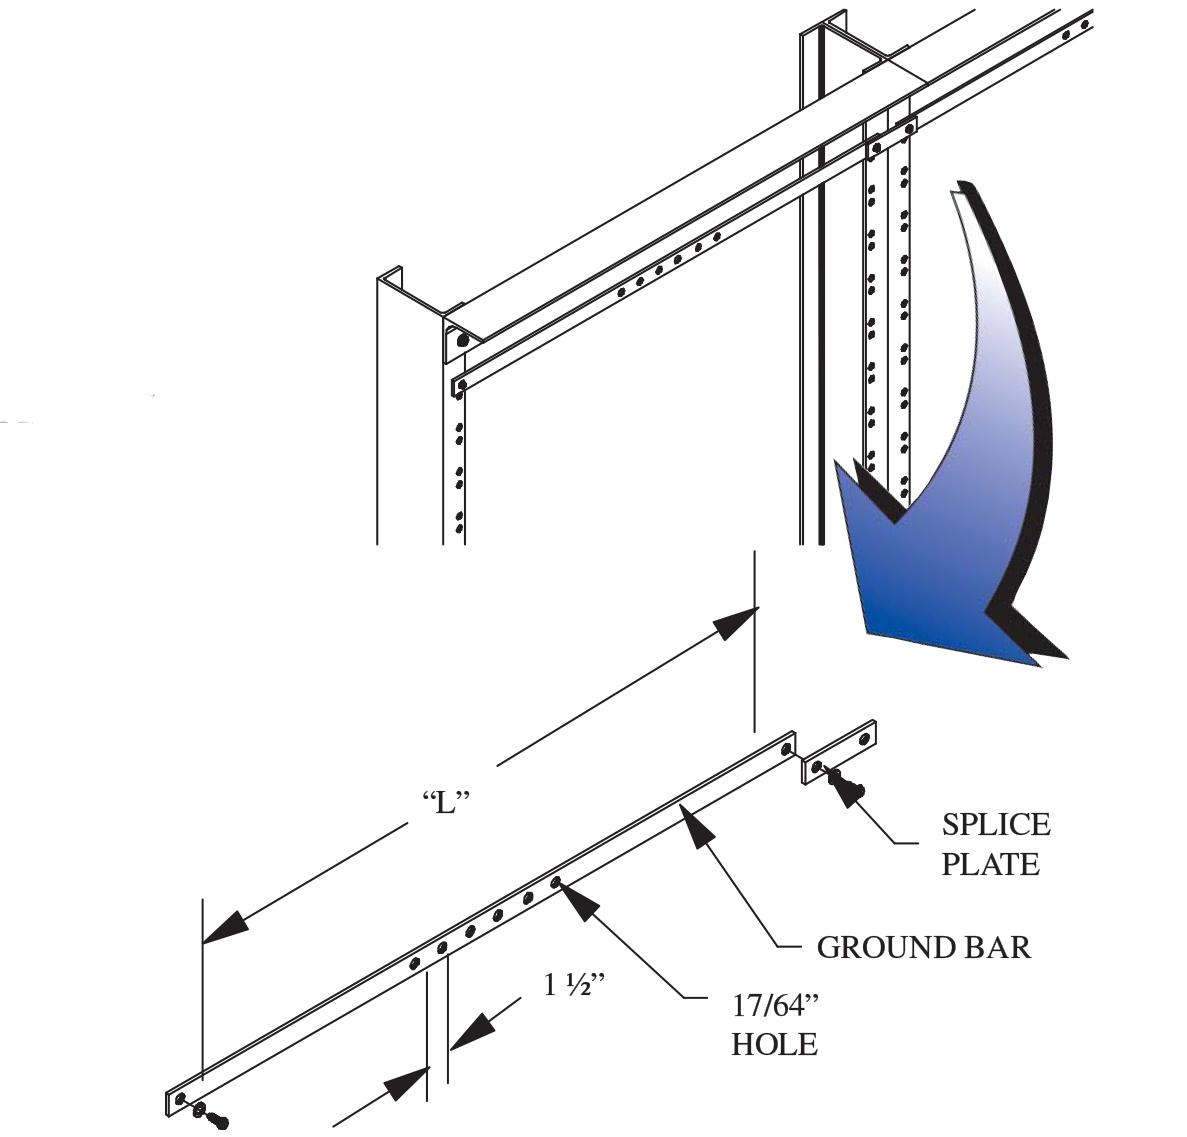 Relay Rack Ground Bar